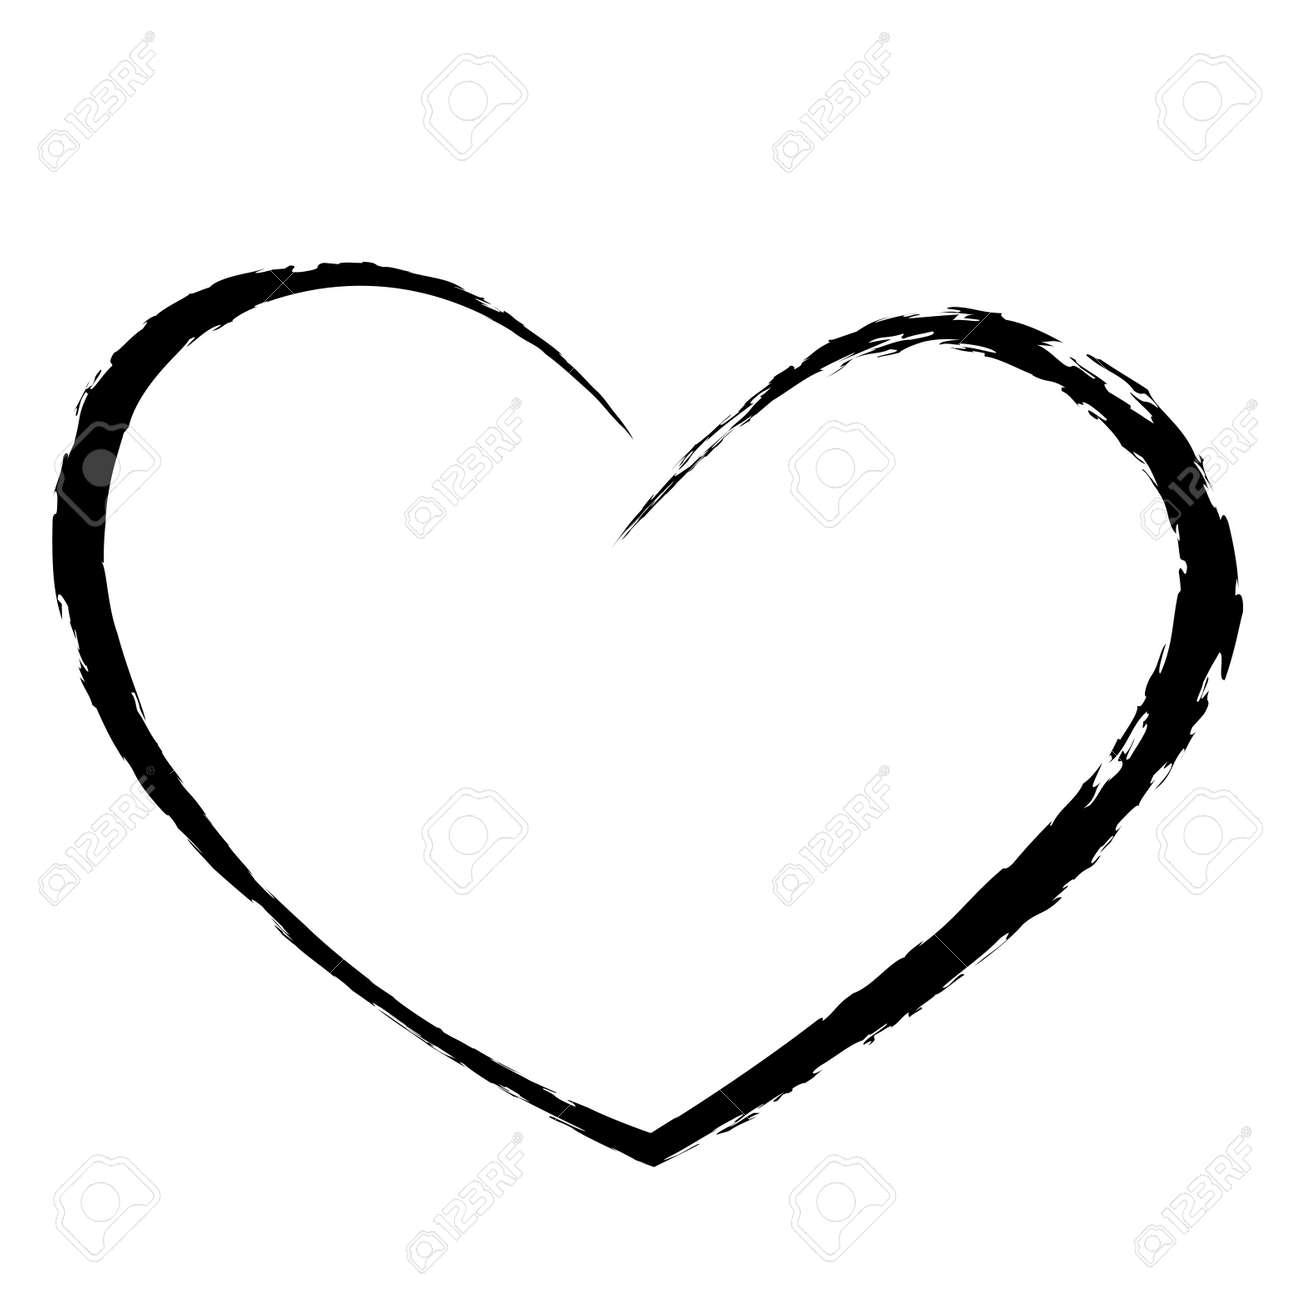 black heart drawing love valentine - 52329916